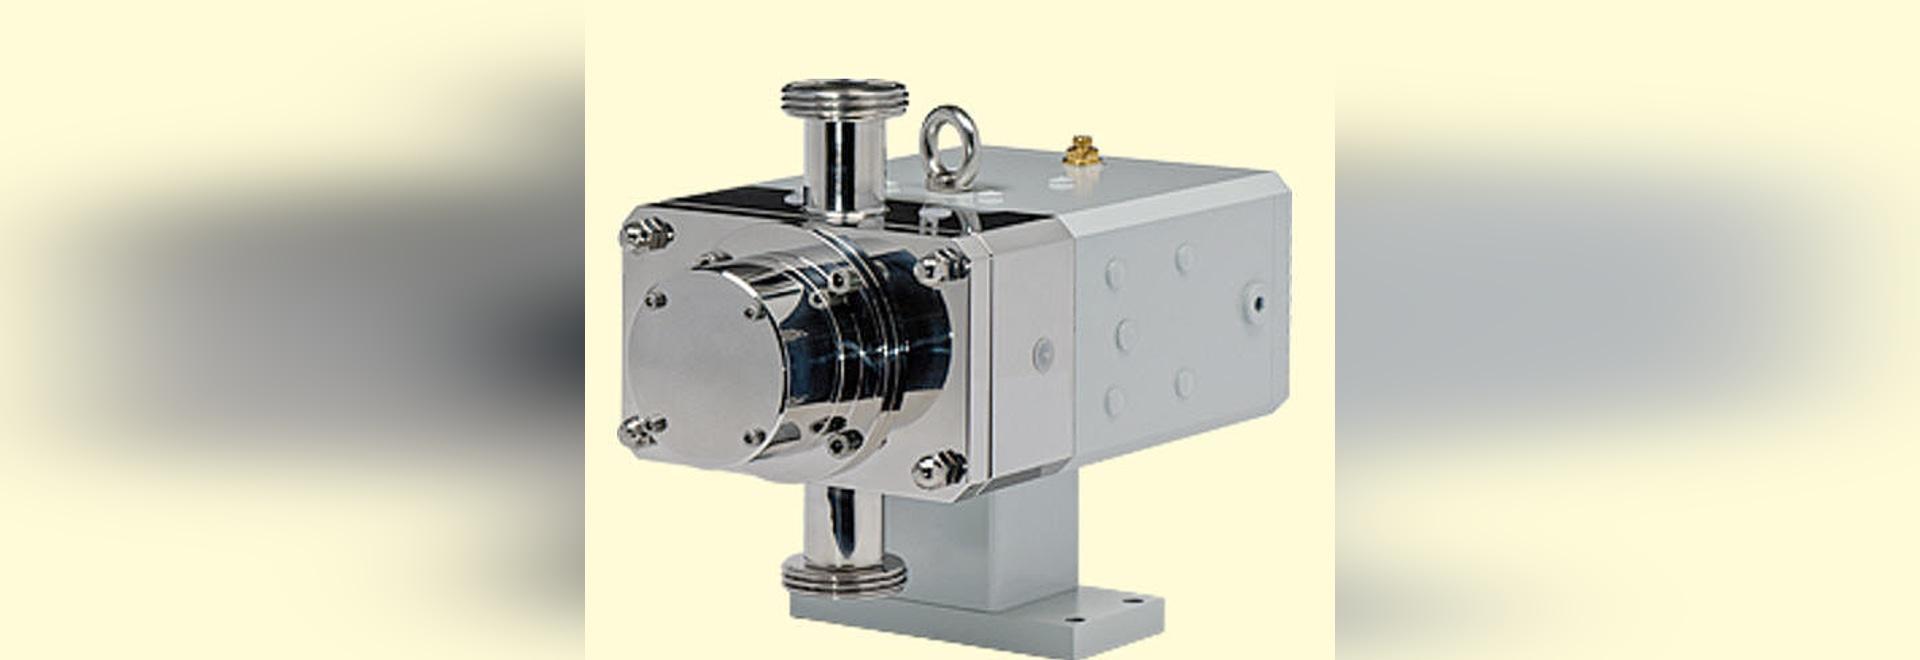 Hygienic pumps type HKK Rotary-lobe pumps